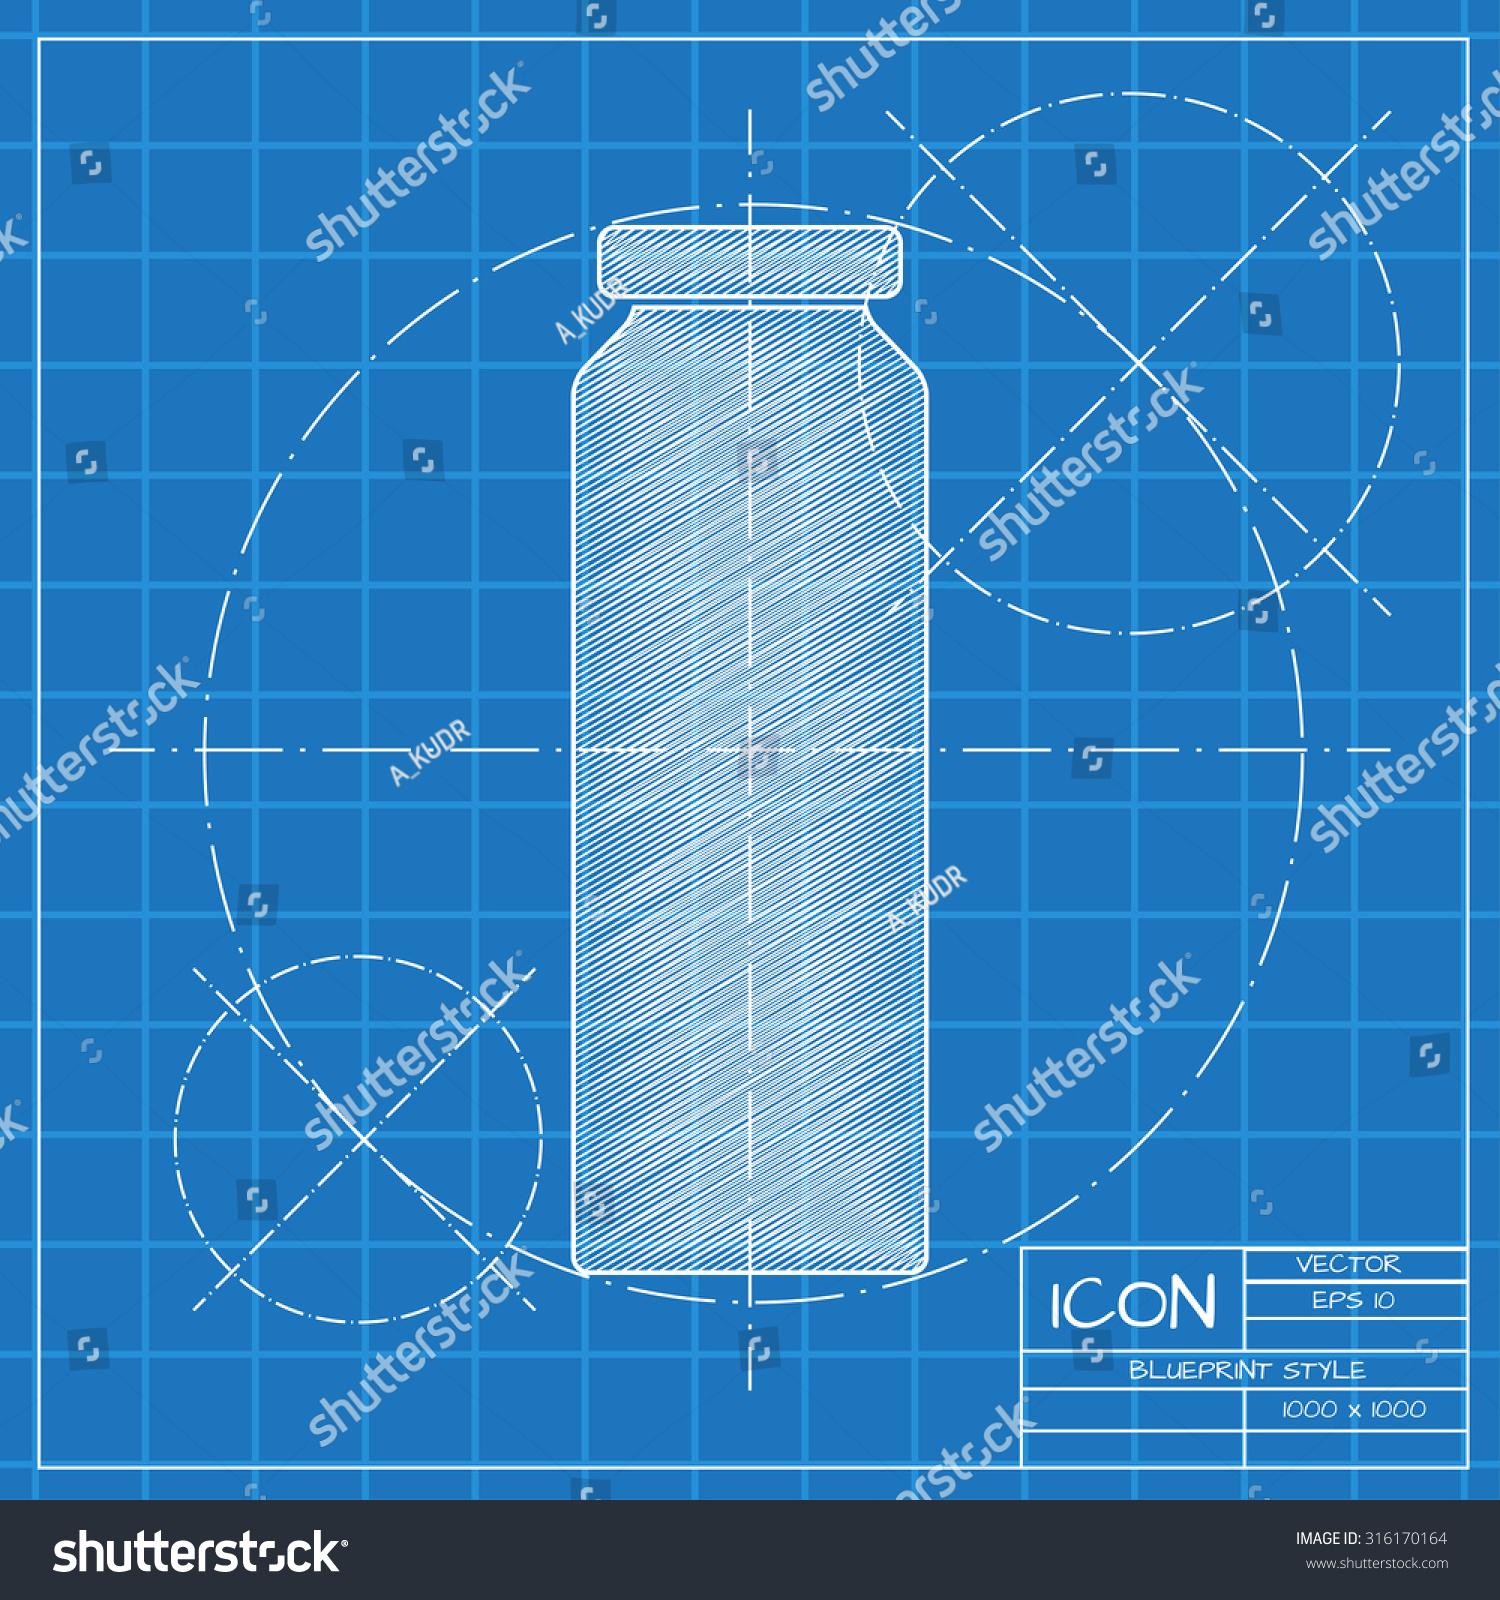 Vector blueprint bottle juice template on stock vector 316170164 vector blueprint bottle juice template on stock vector 316170164 shutterstock malvernweather Image collections